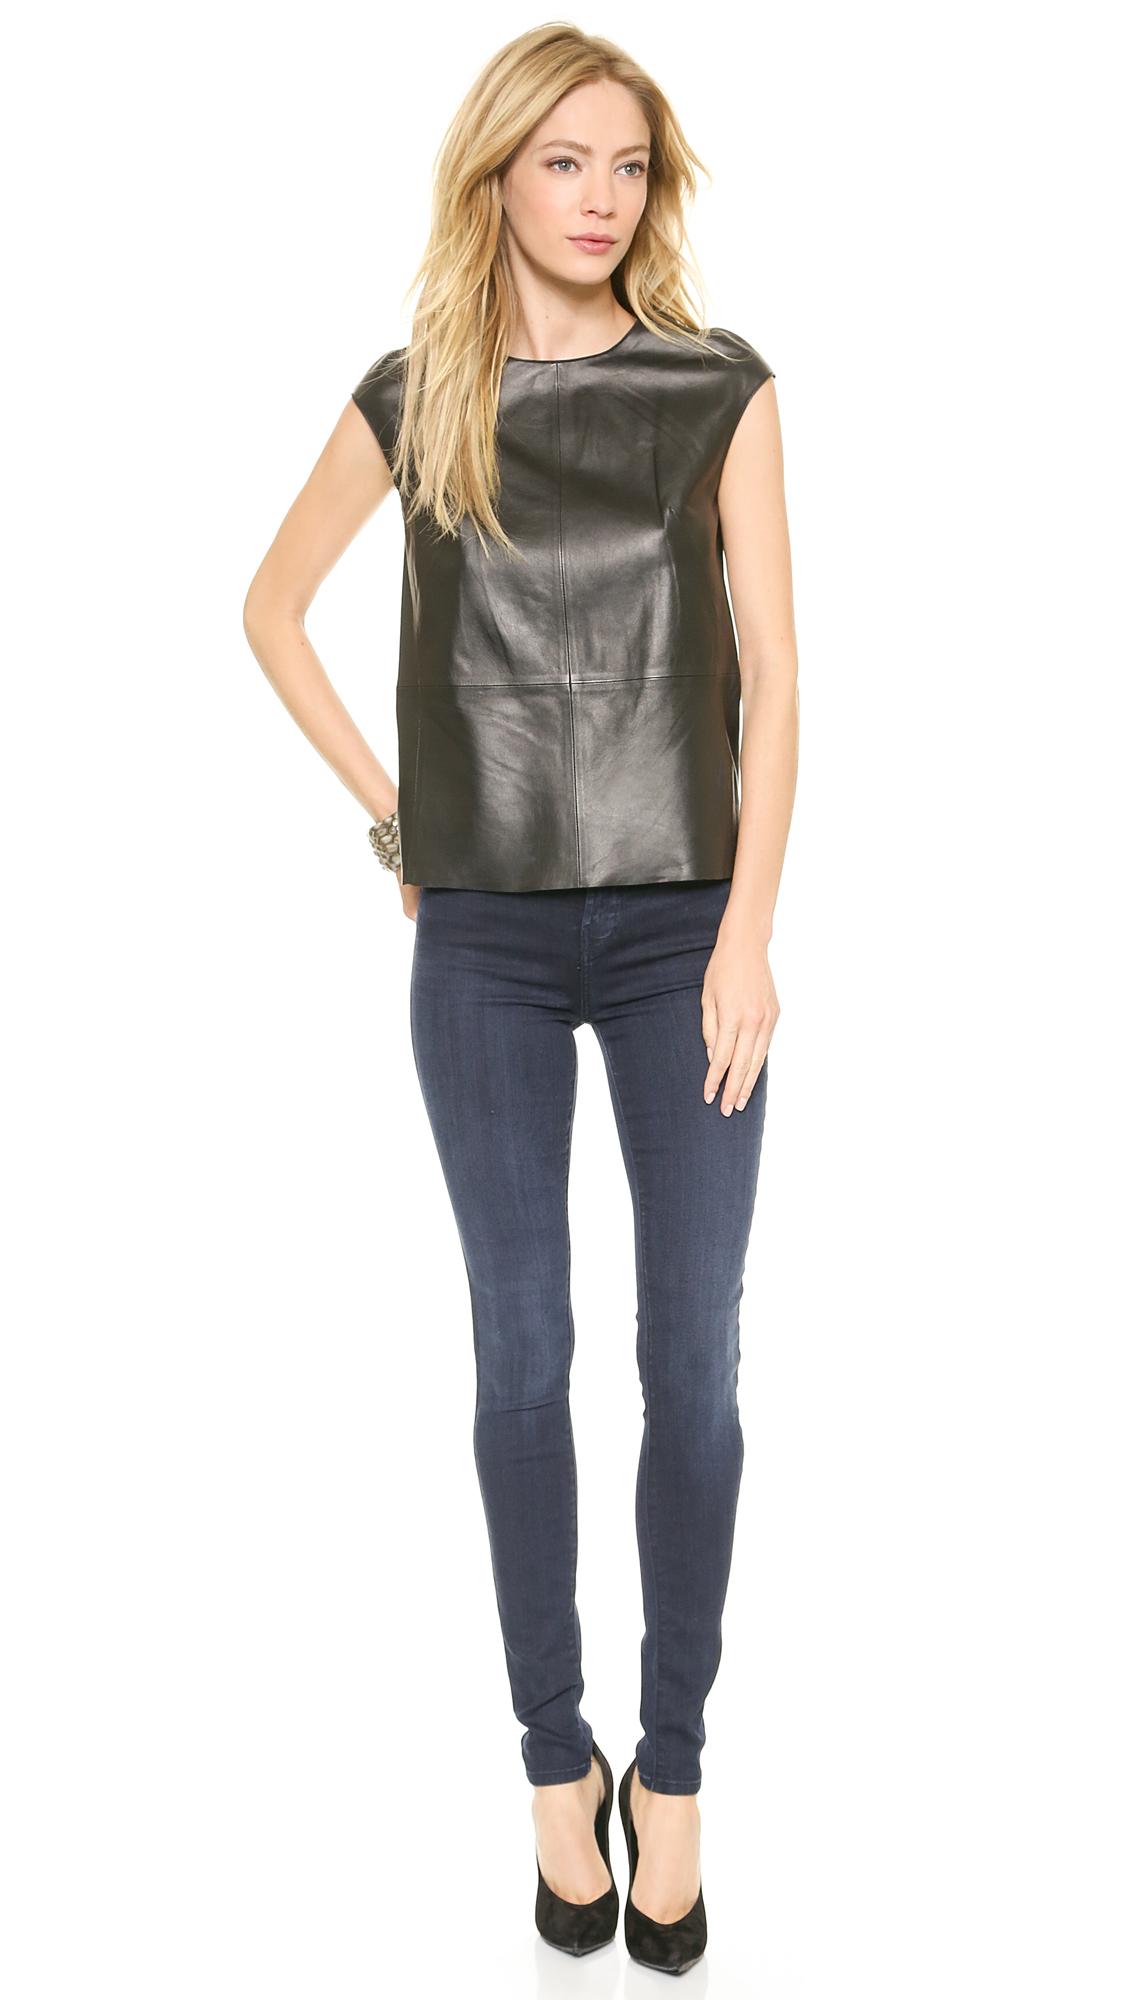 Lyst - J Brand Karo Leather Top Black in Black - photo #26